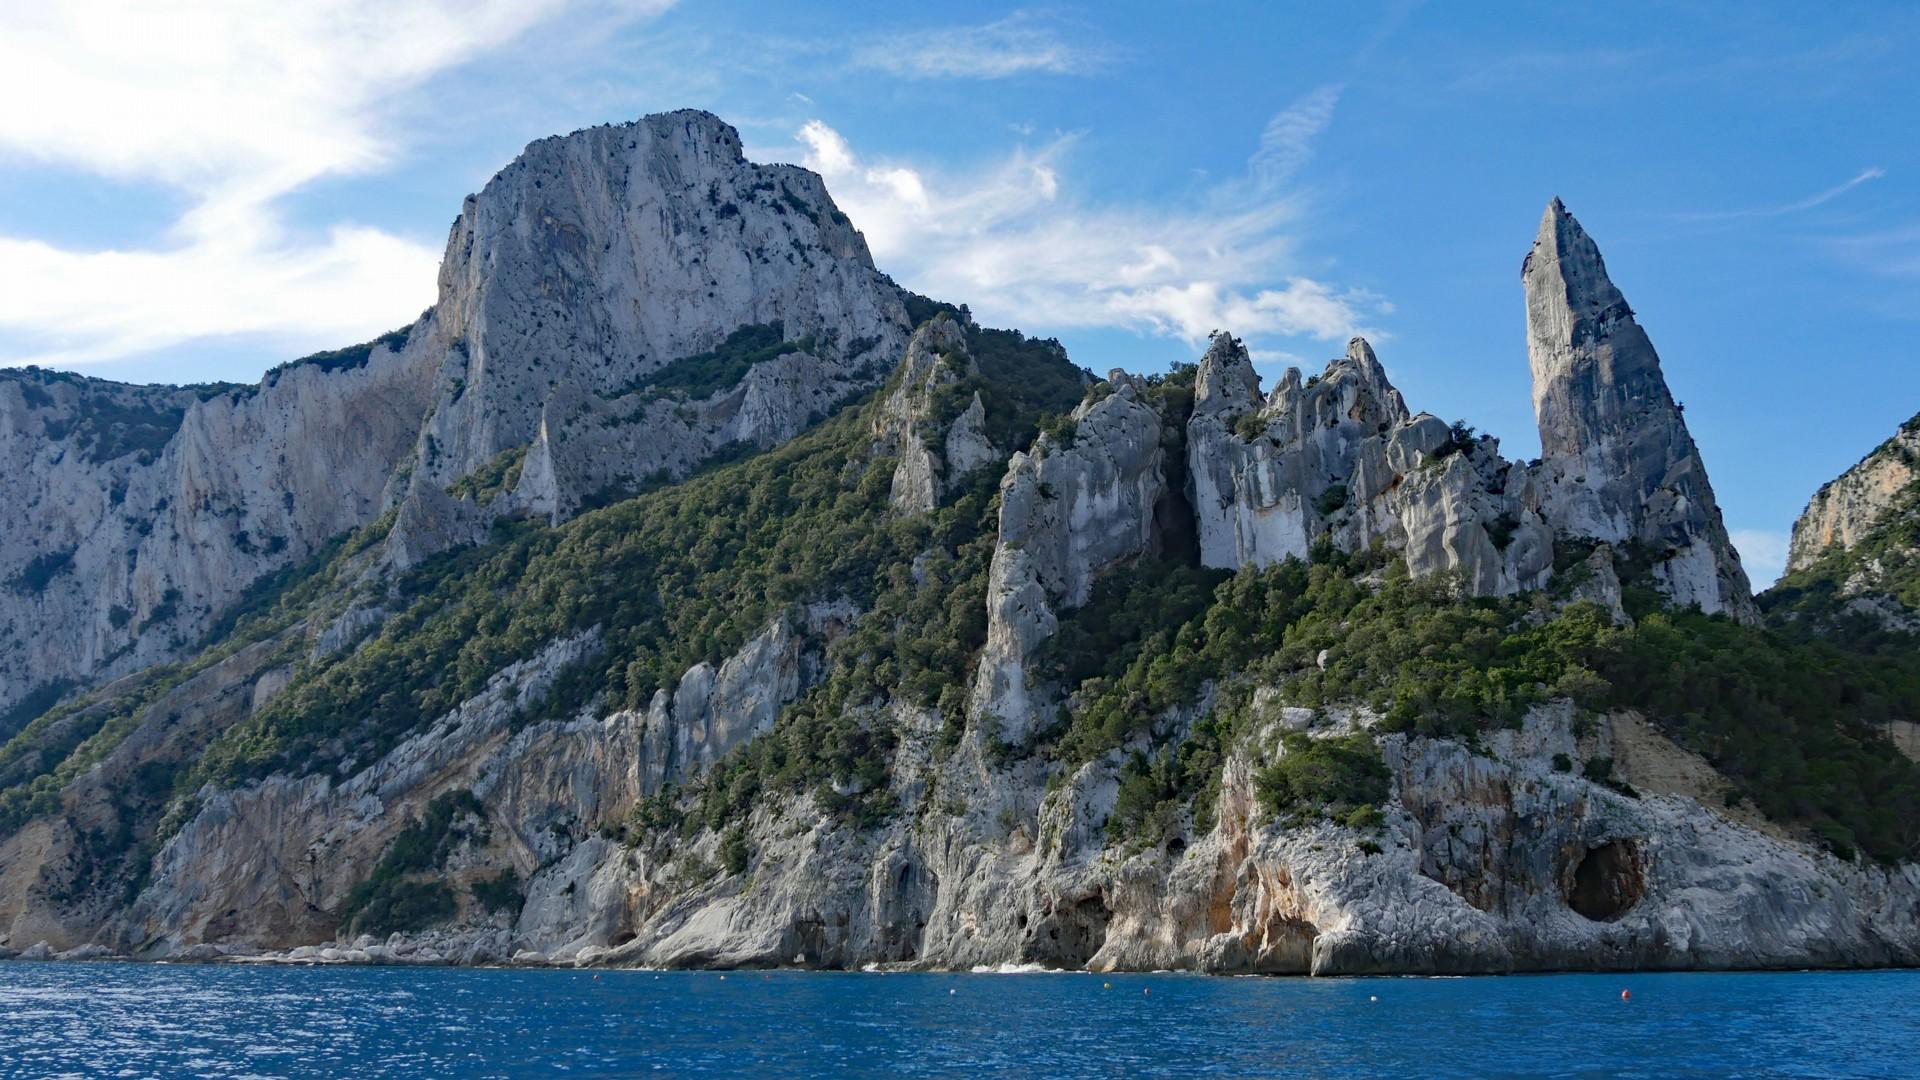 Cala Gonone - morning light on the sea cliffs4.jpg - Sardinia - Wilderness Blue Sea Kayaking - Kayaking